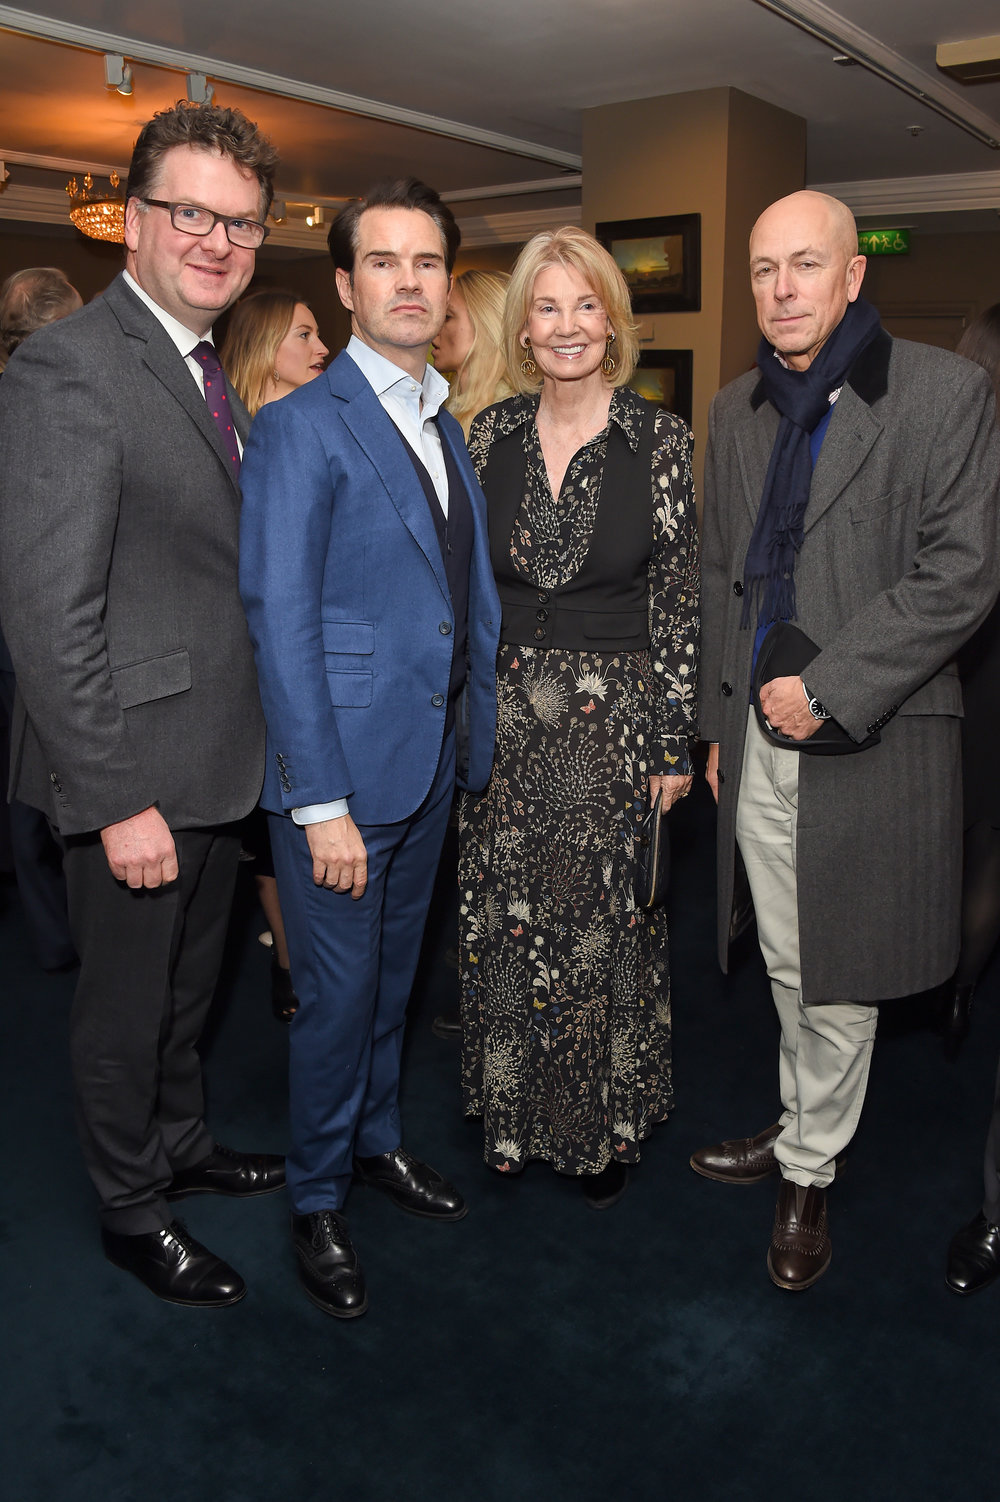 Ewan Venters, Jimmy Carr, Hilary Weston and Dylan Jones. Courtesy of Dave Benett.